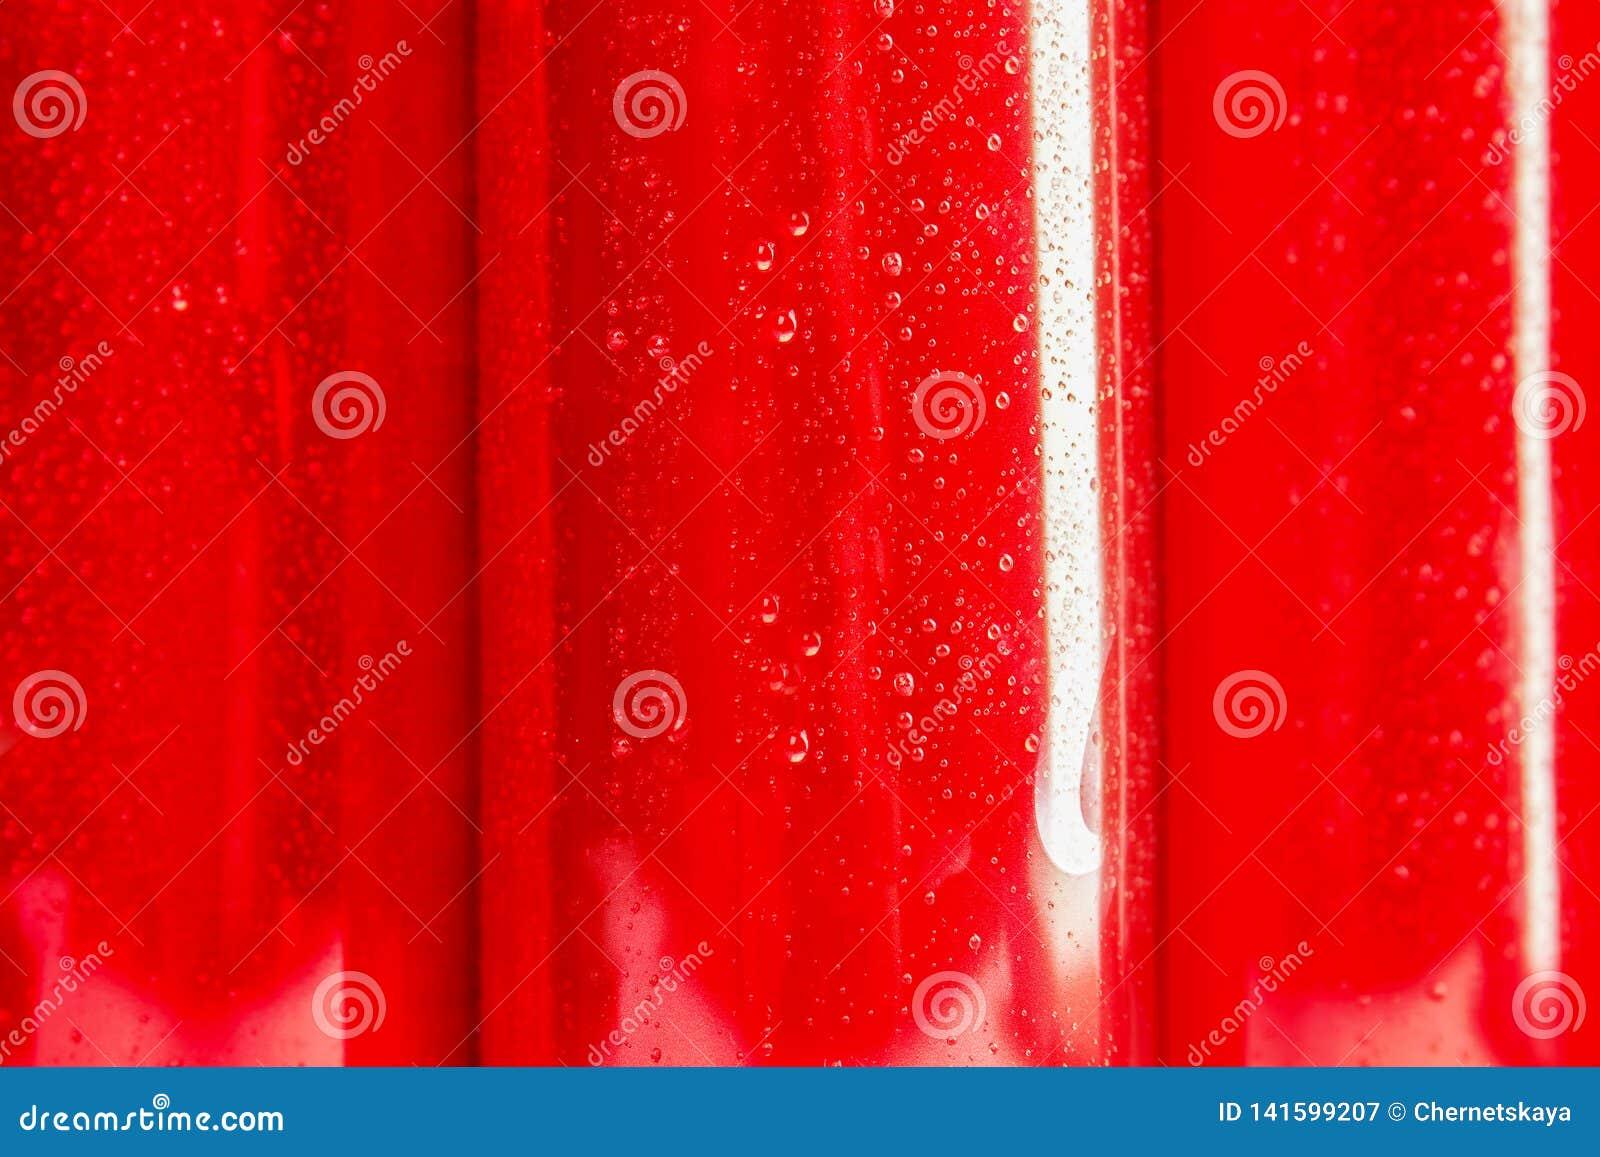 MYKOLAIV, ΟΥΚΡΑΝΙΑ - 15 ΝΟΕΜΒΡΊΟΥ 2018: Δοχεία κόκα κόλα ως υπόβαθρο